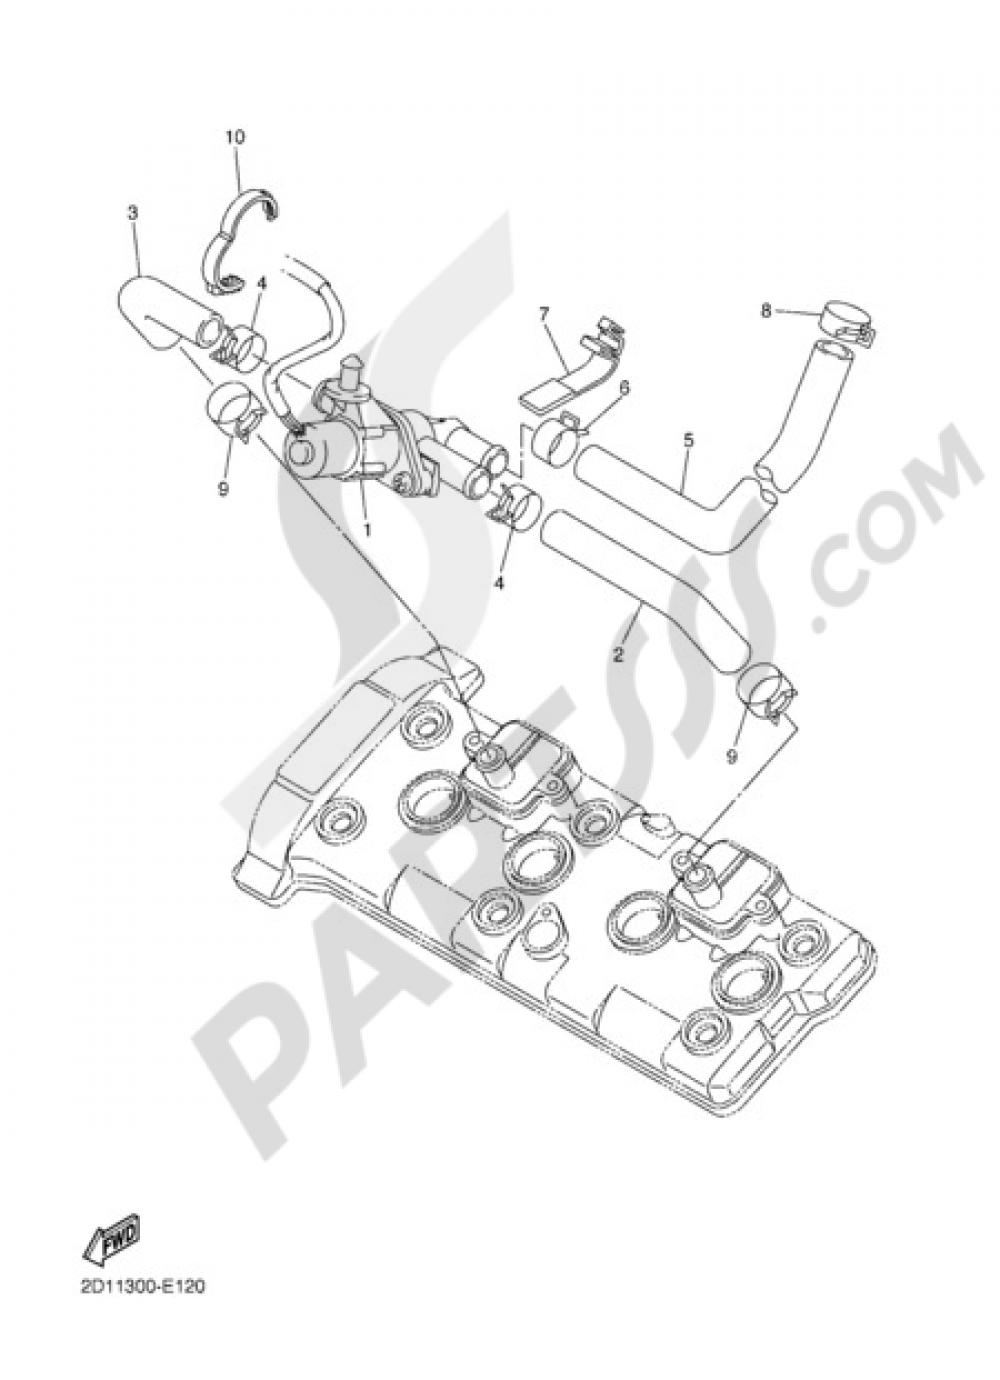 Air Induction System Yamaha Fz1 Fazer 2006